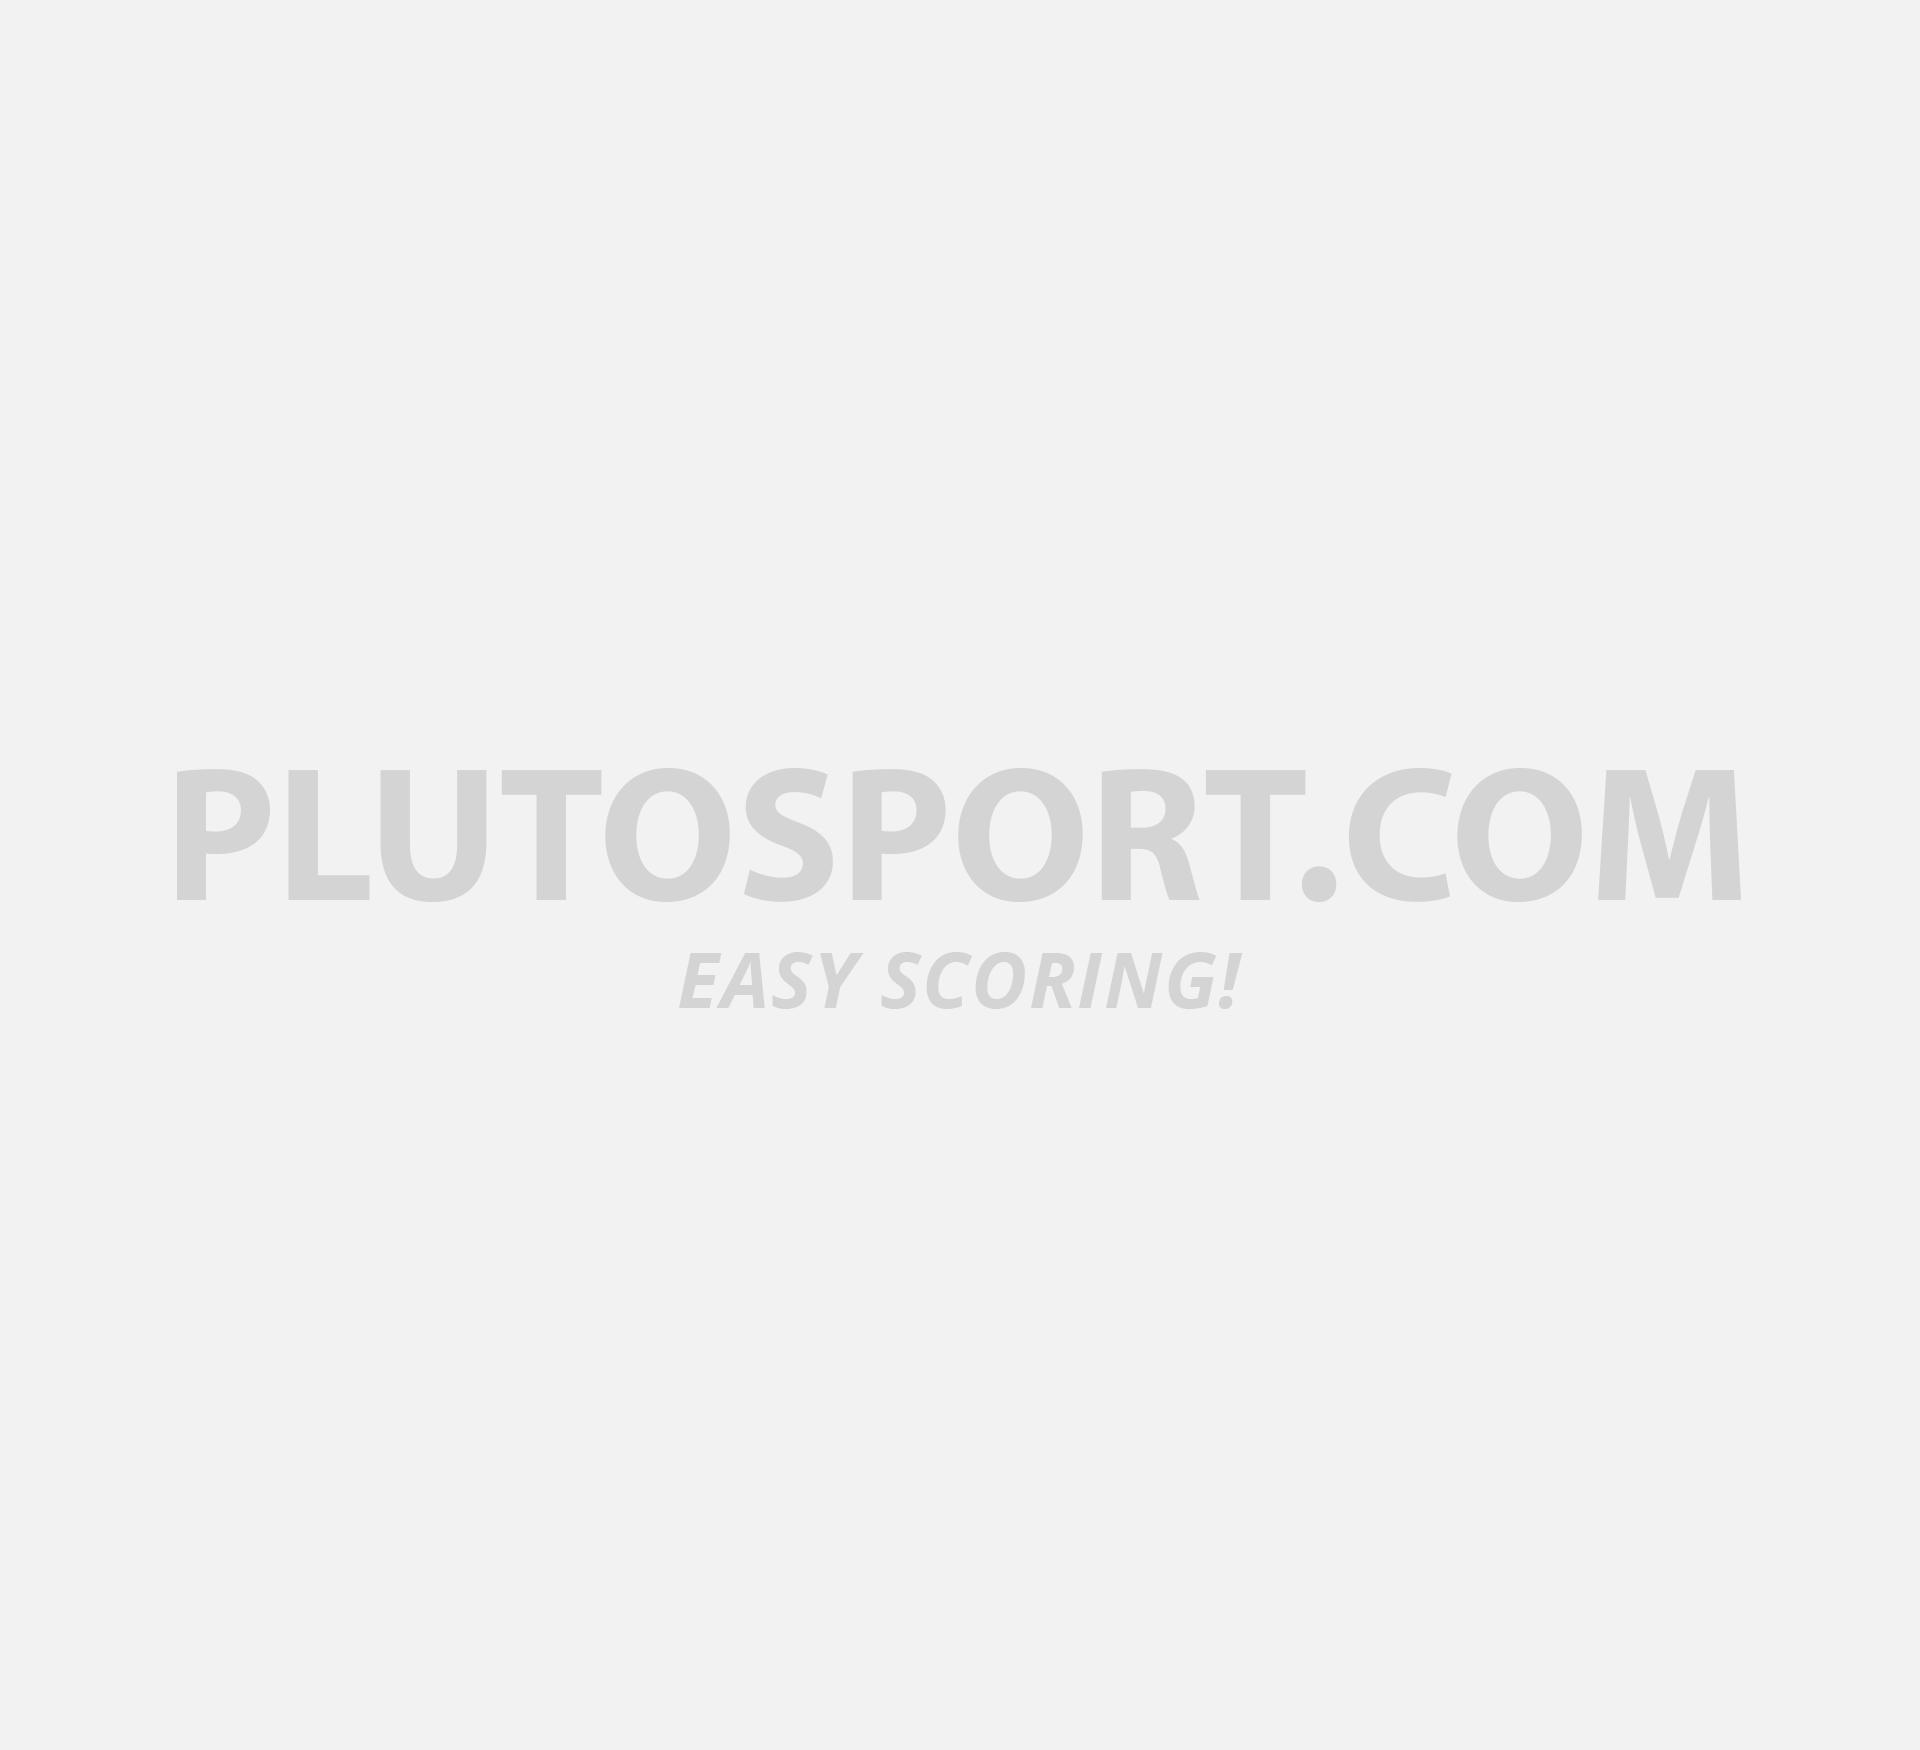 8a7a460189b Adidas Barricade Cap Polo Wms - Polo shirts - Clothing - Tennis ...